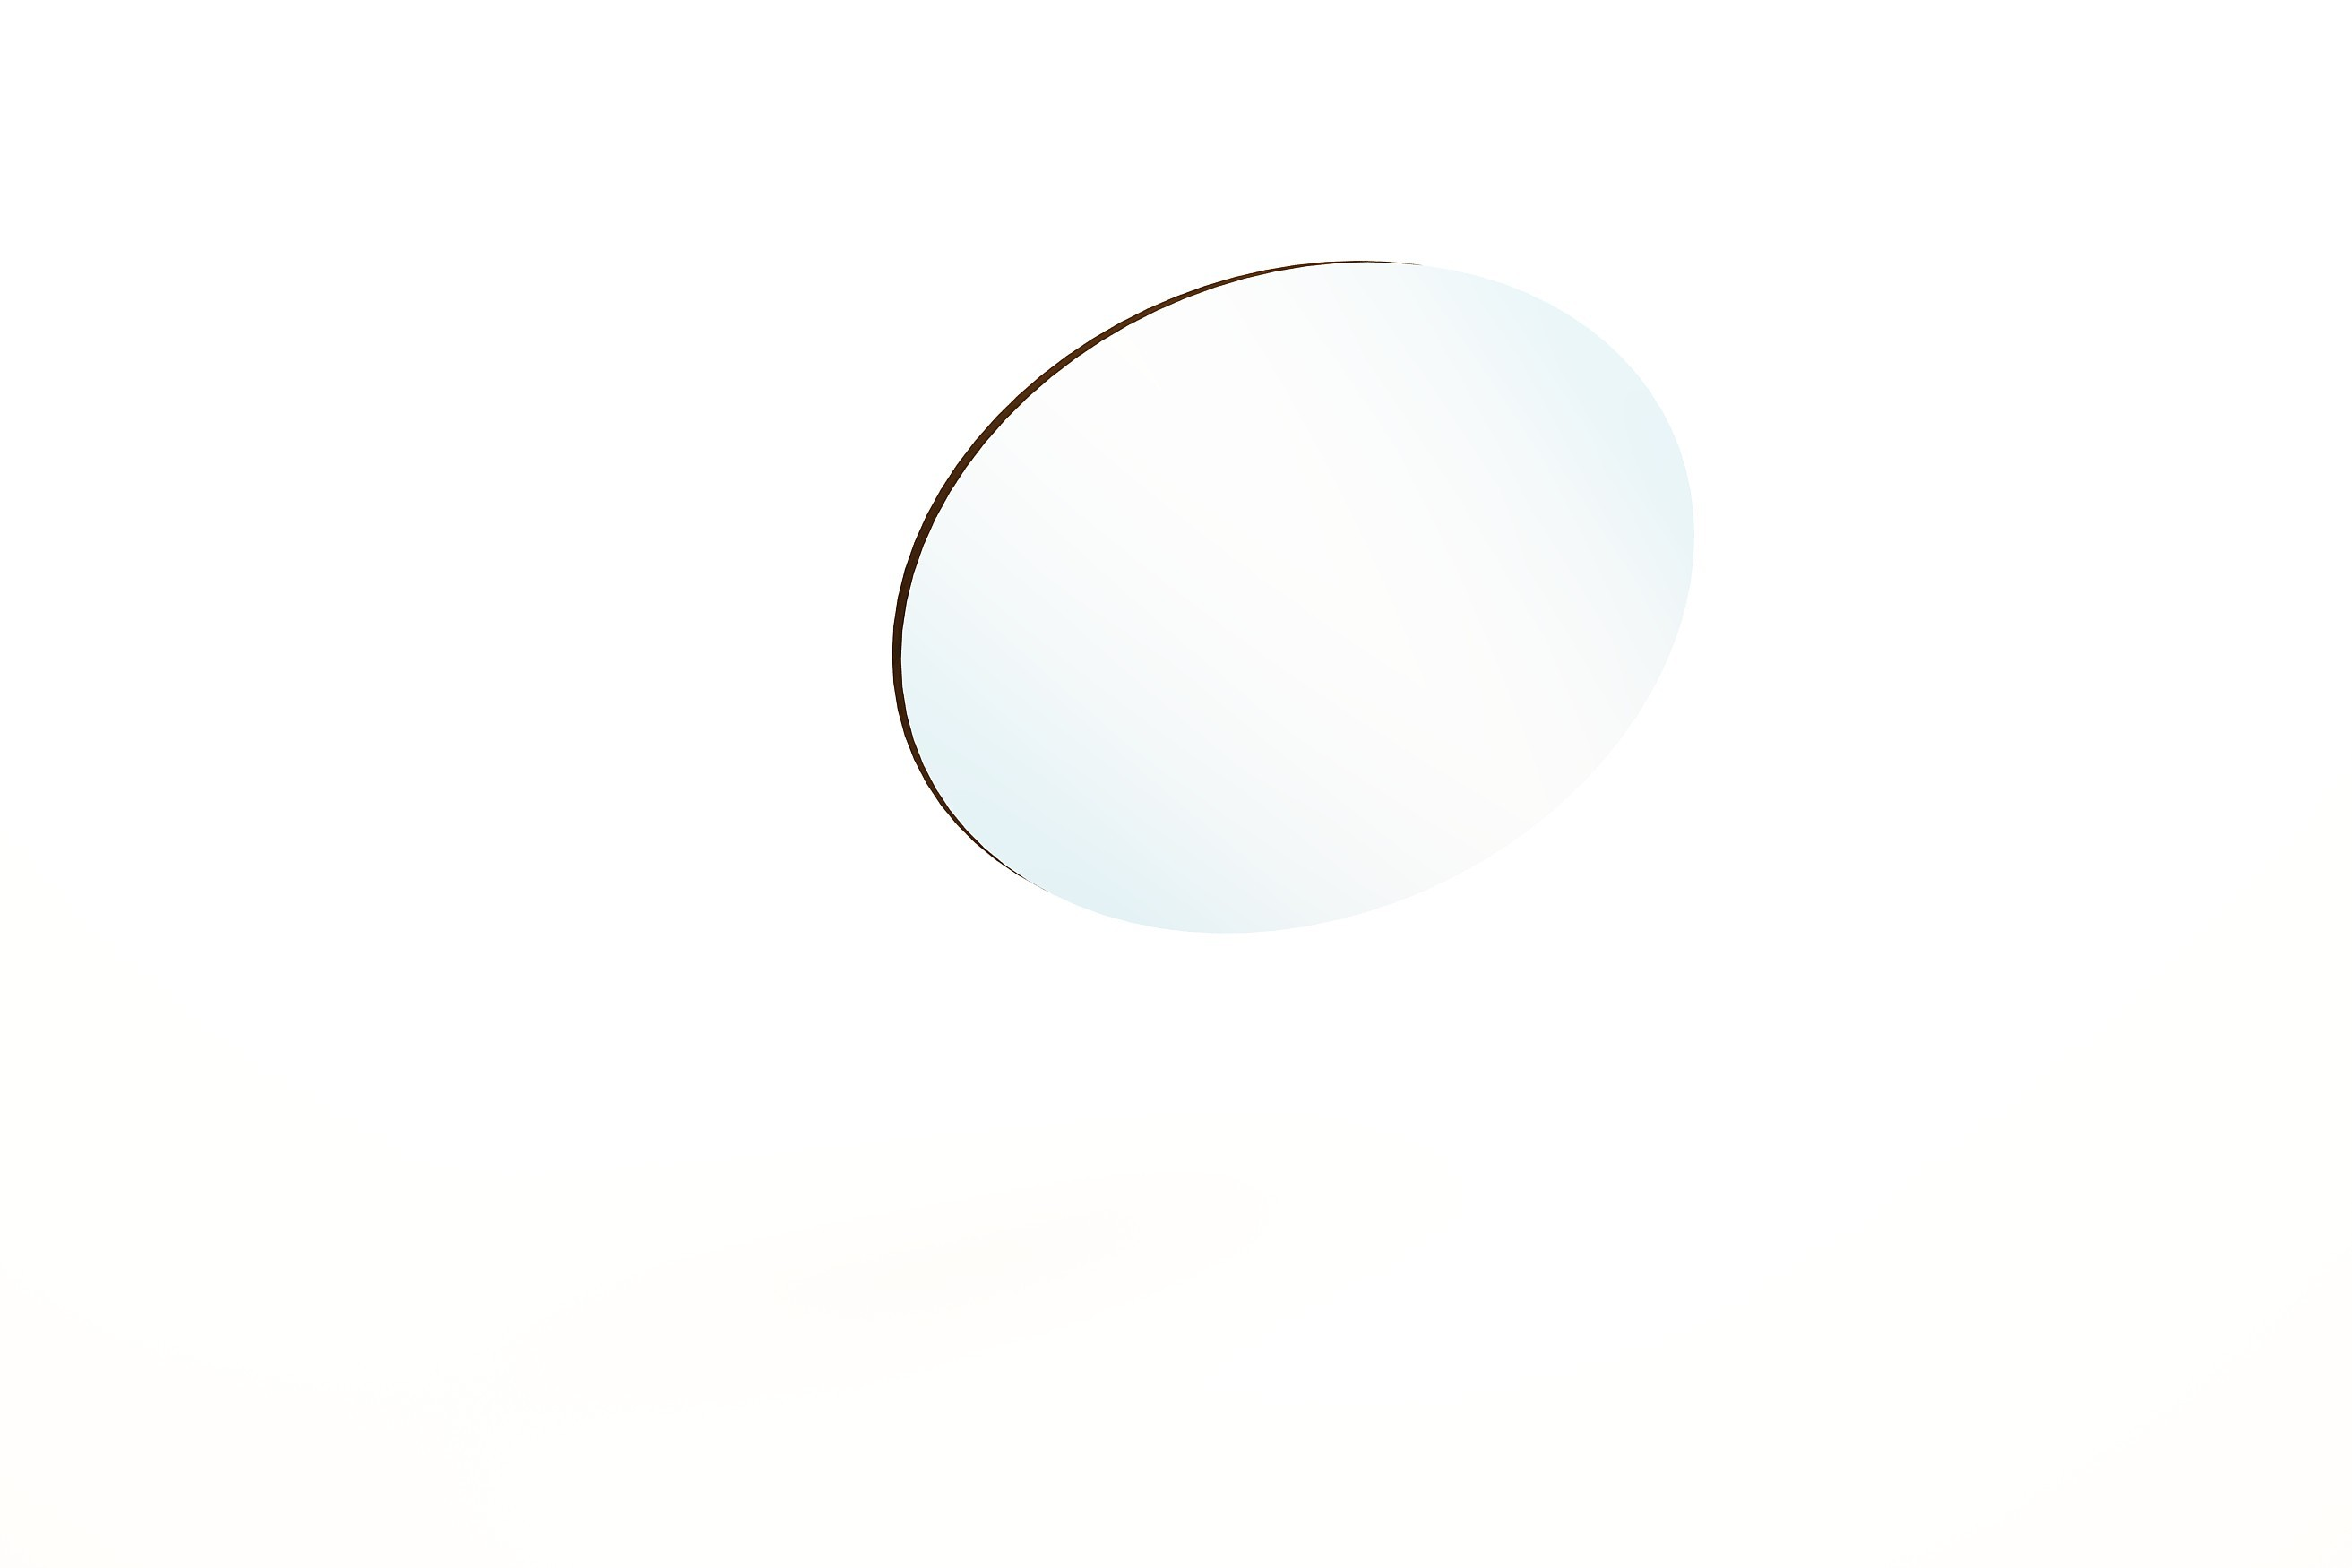 Зеркало Адажио 602.00 АнгстремЗеркала<br><br><br>Артикул: 215.094.01<br>Высота: 600<br>Ширина: 1000<br>Глубина: 20